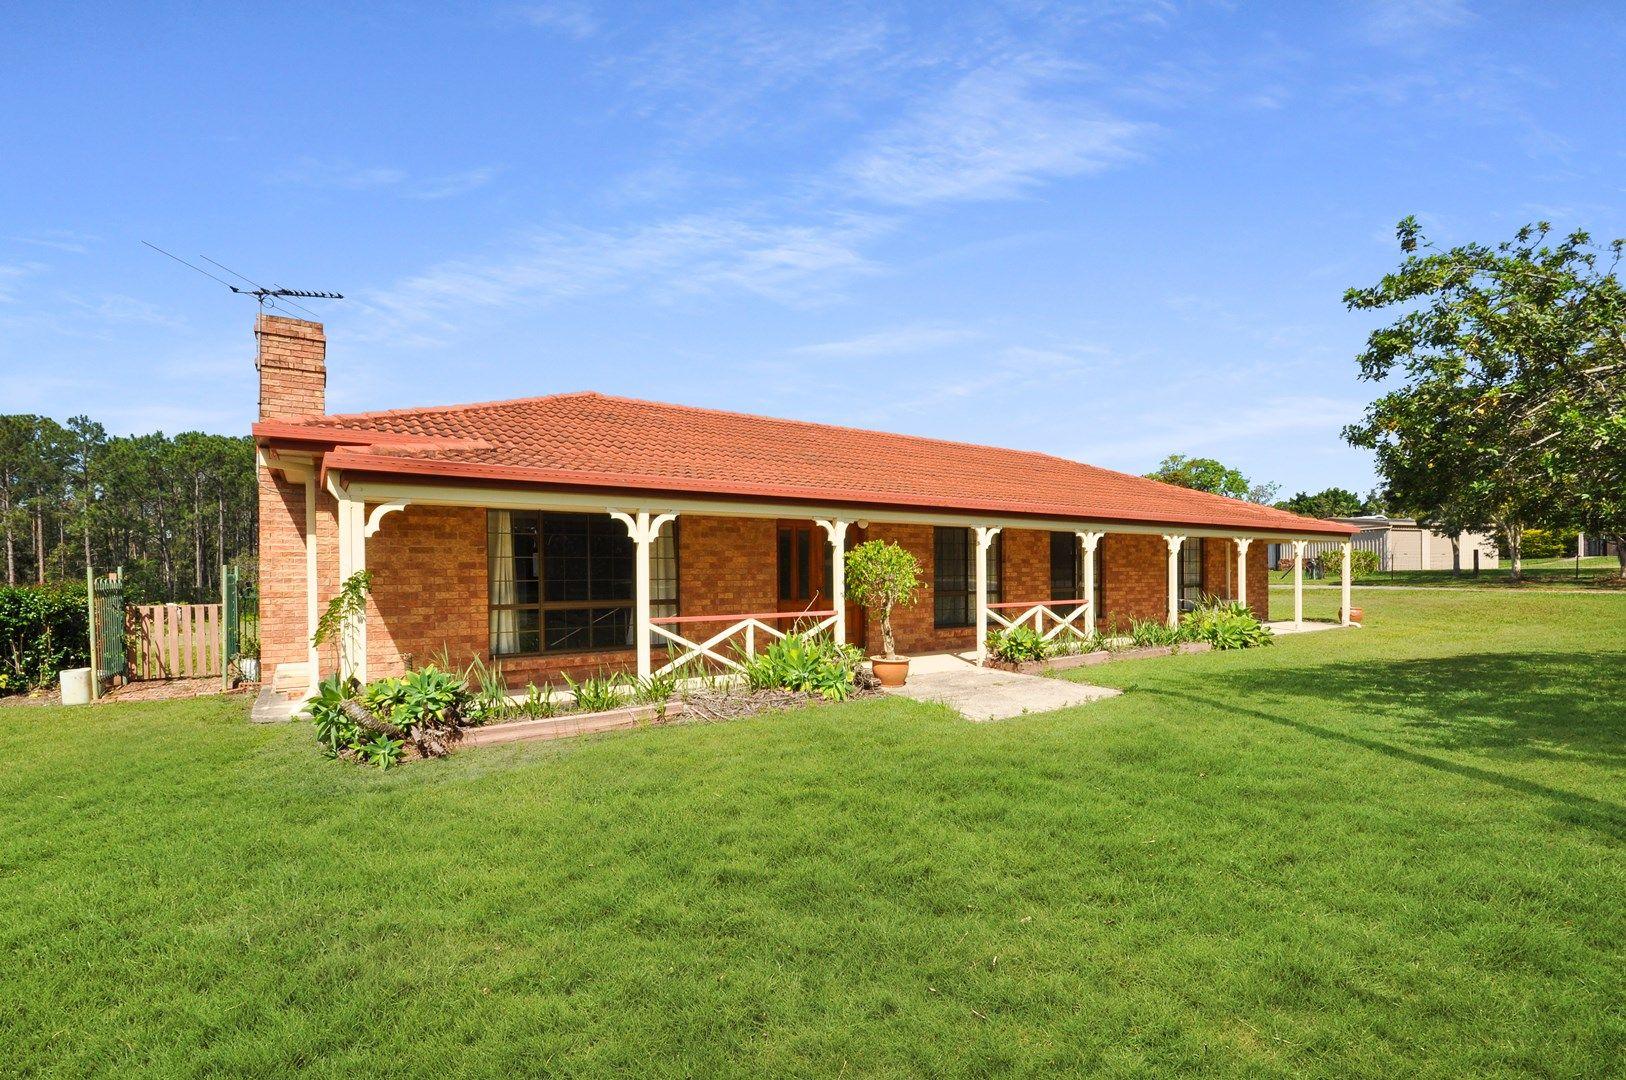 11 Alvisio Court, Narangba QLD 4504, Image 0